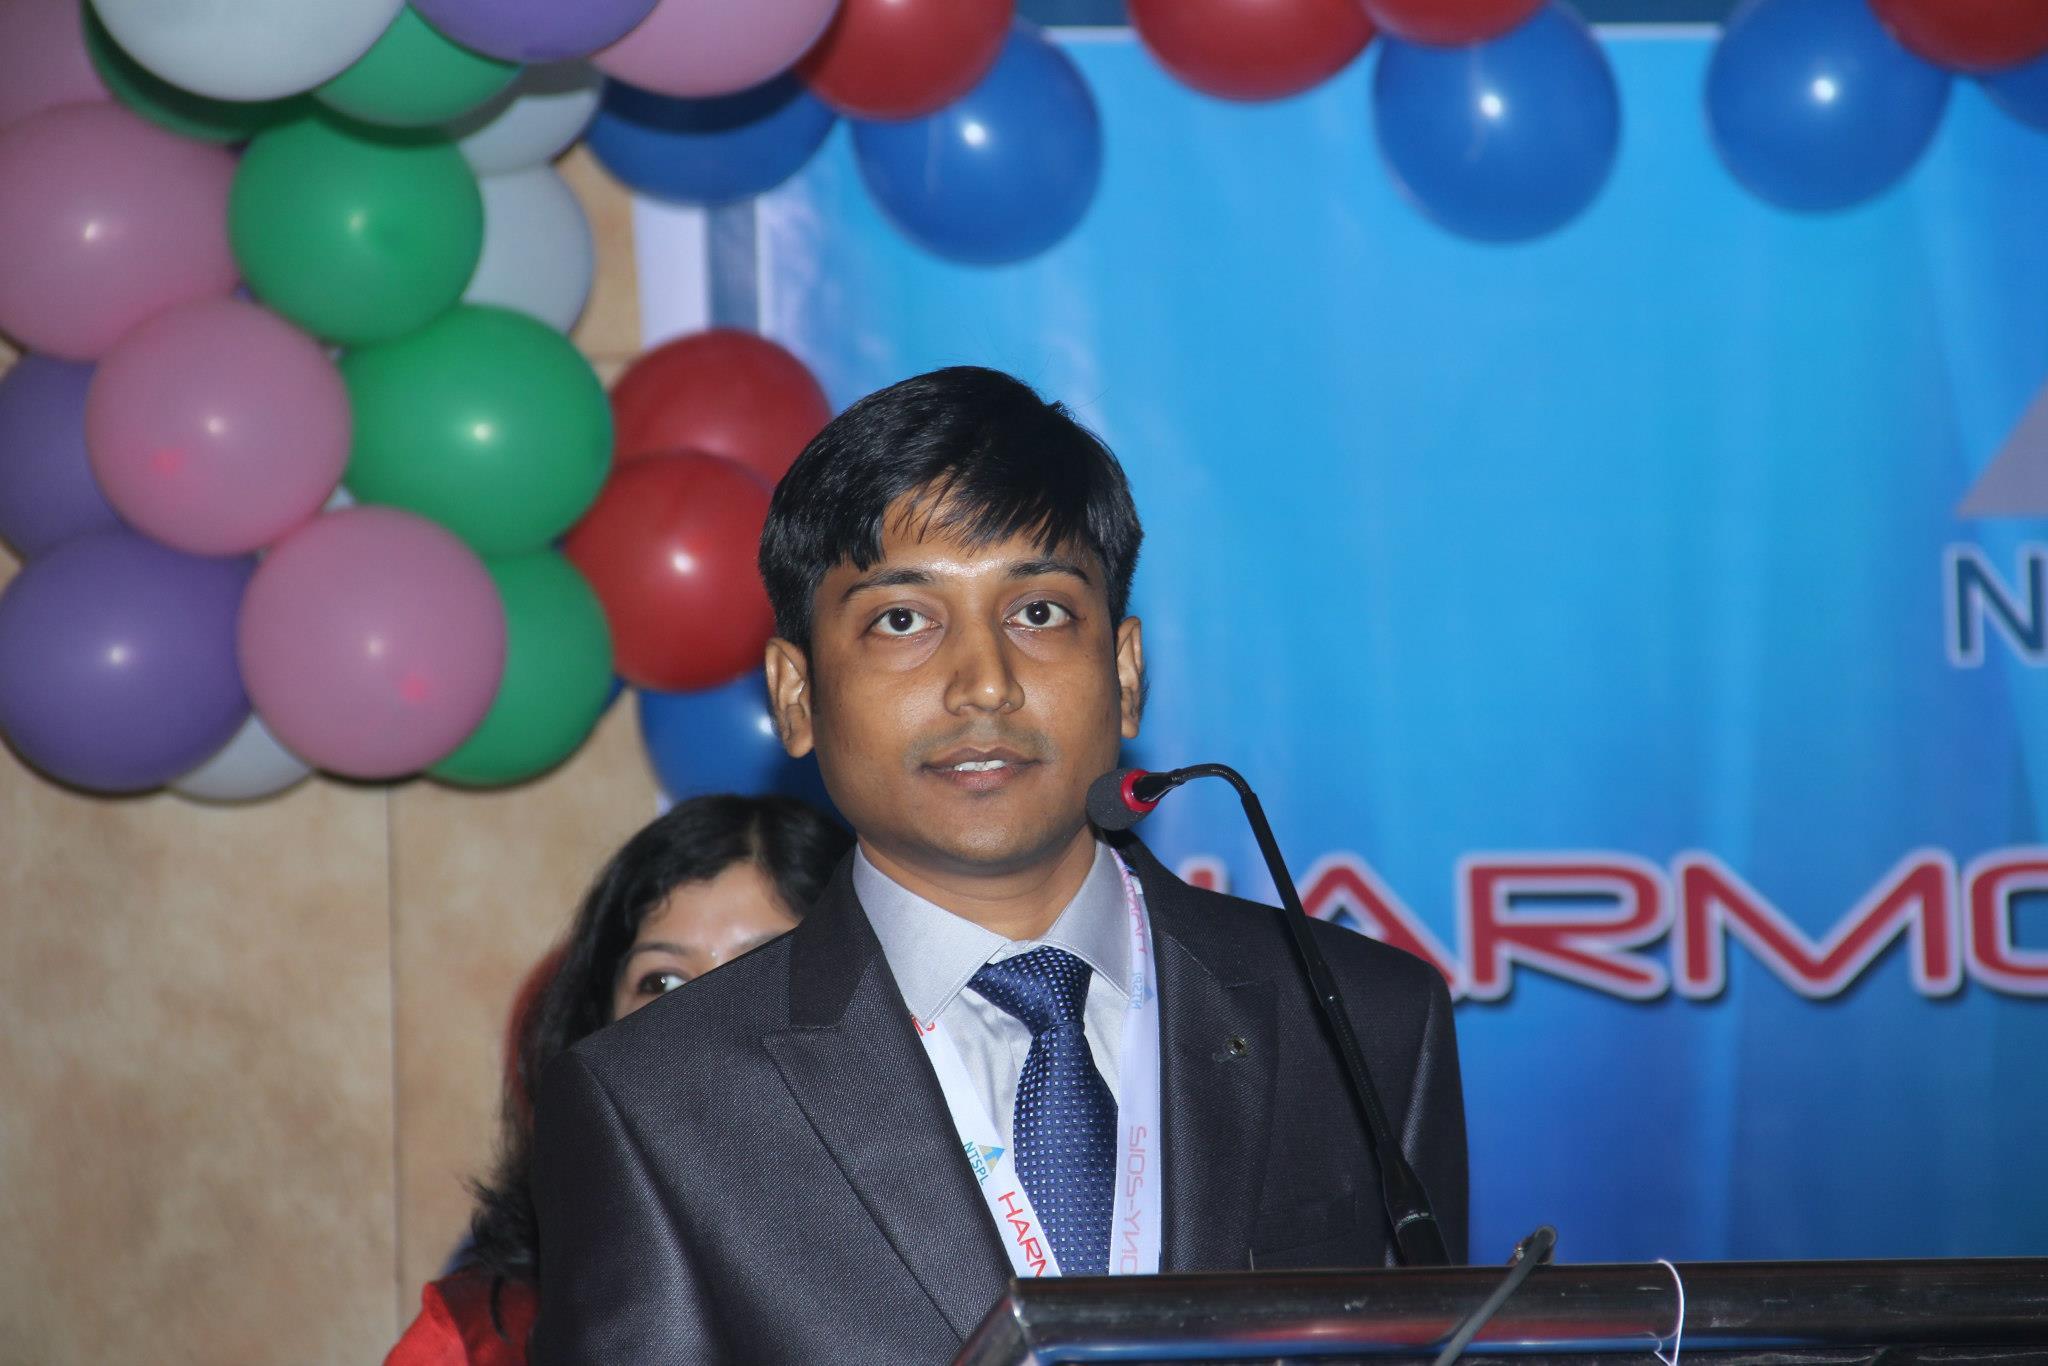 Tremendous Speech by Mr Sagar Mohanty (Managing Director)